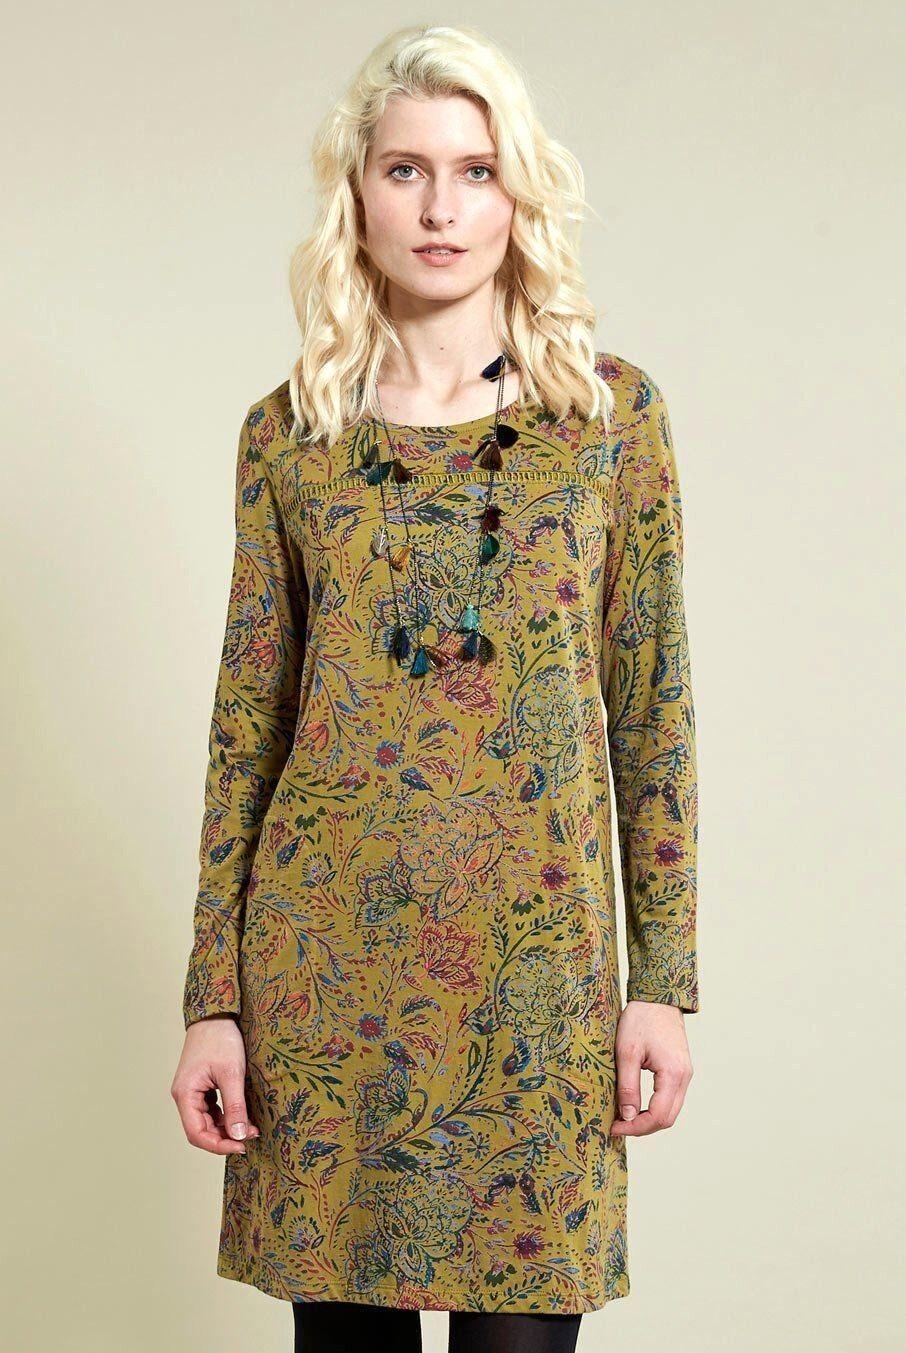 SALE NOMADS fair TRADE ORGANIC cotton JERSEY tunic SHIFT dress AMARA AR3019